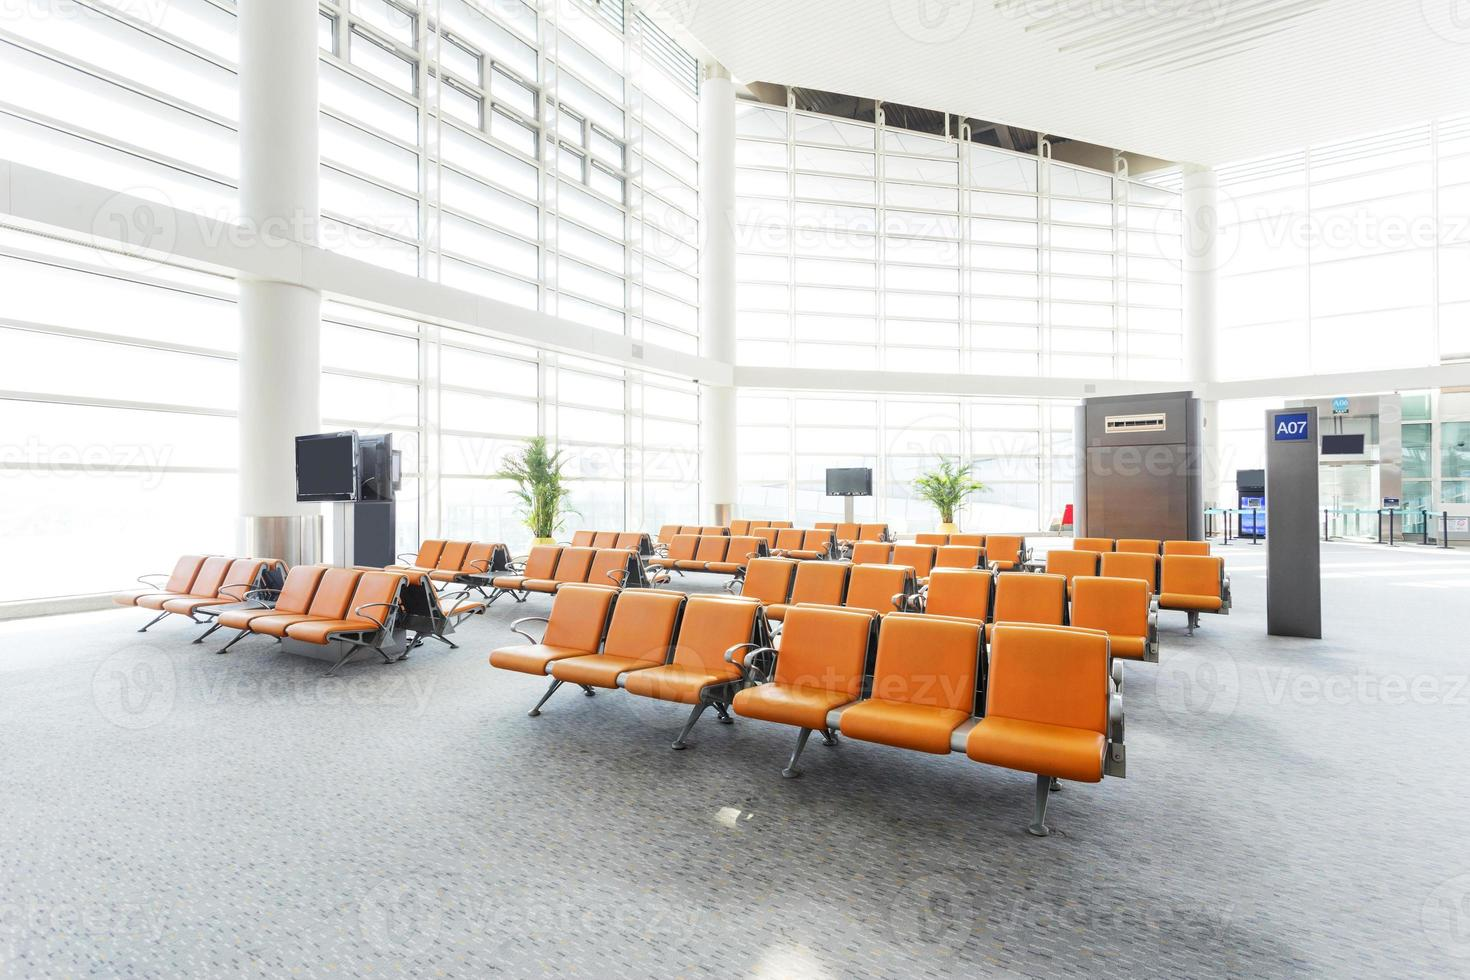 moderno aeropuerto sala de espera interior foto